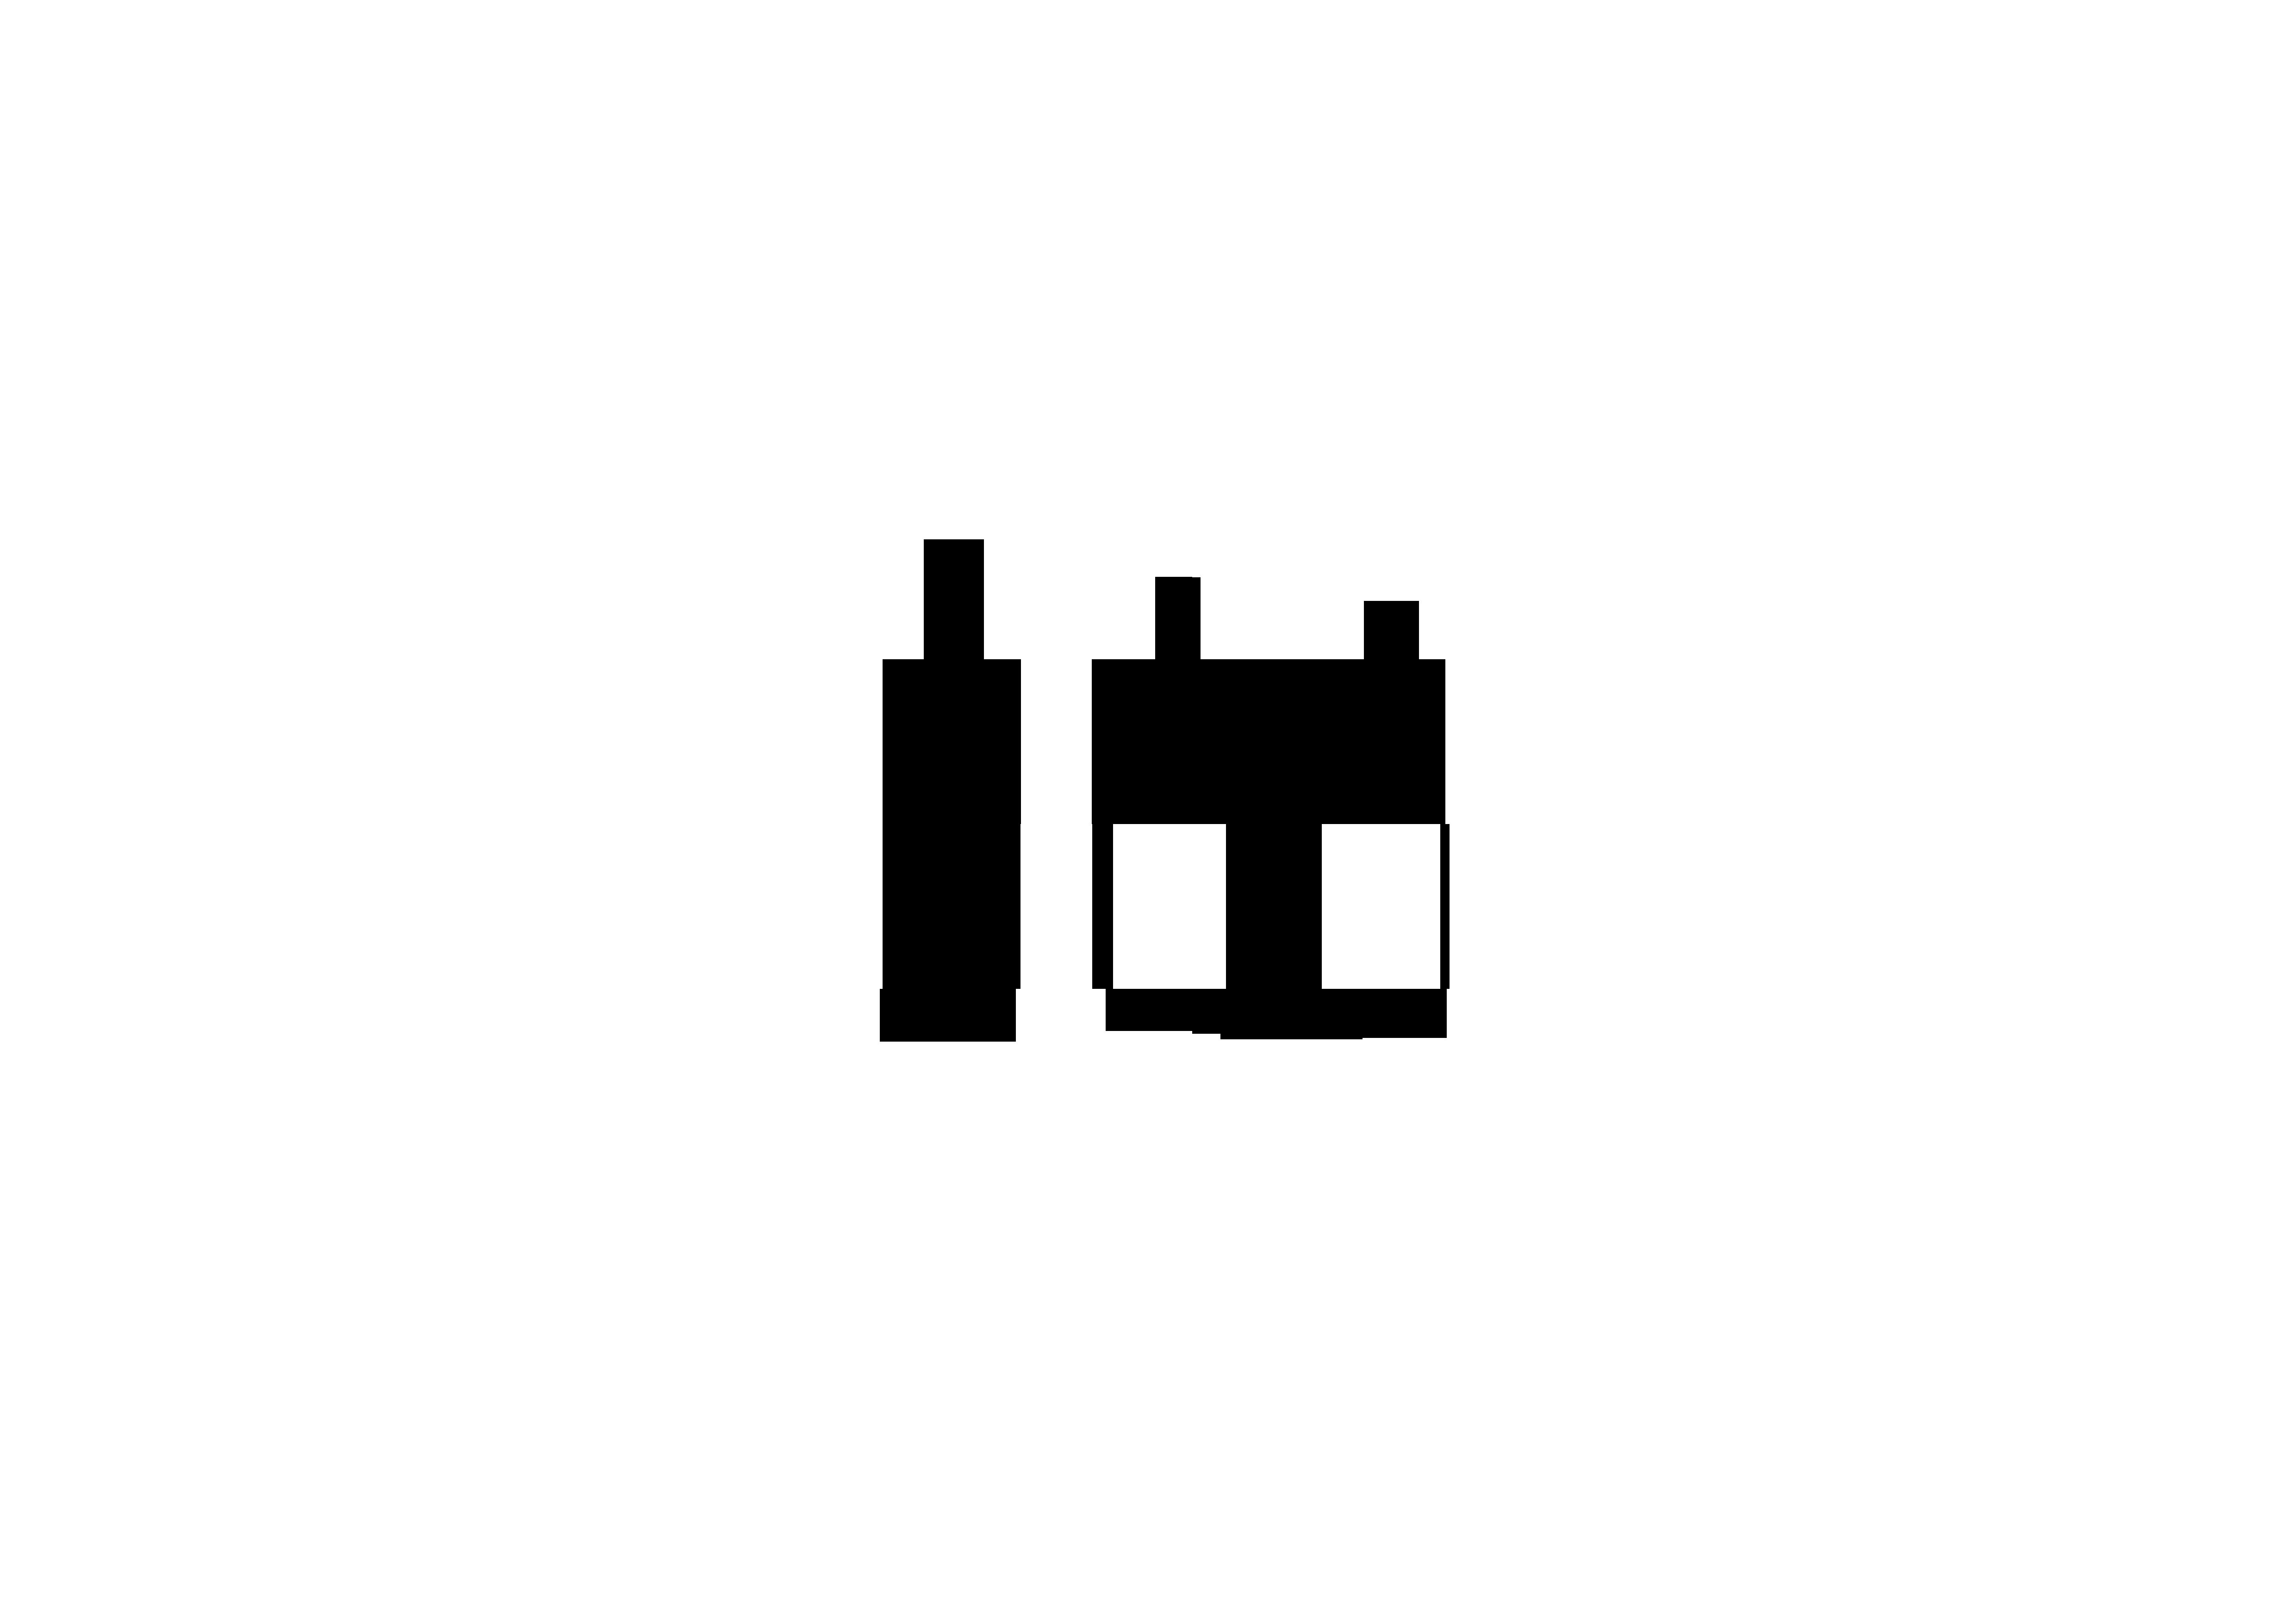 50% Rødaroma 2019 - Apophenia.eu